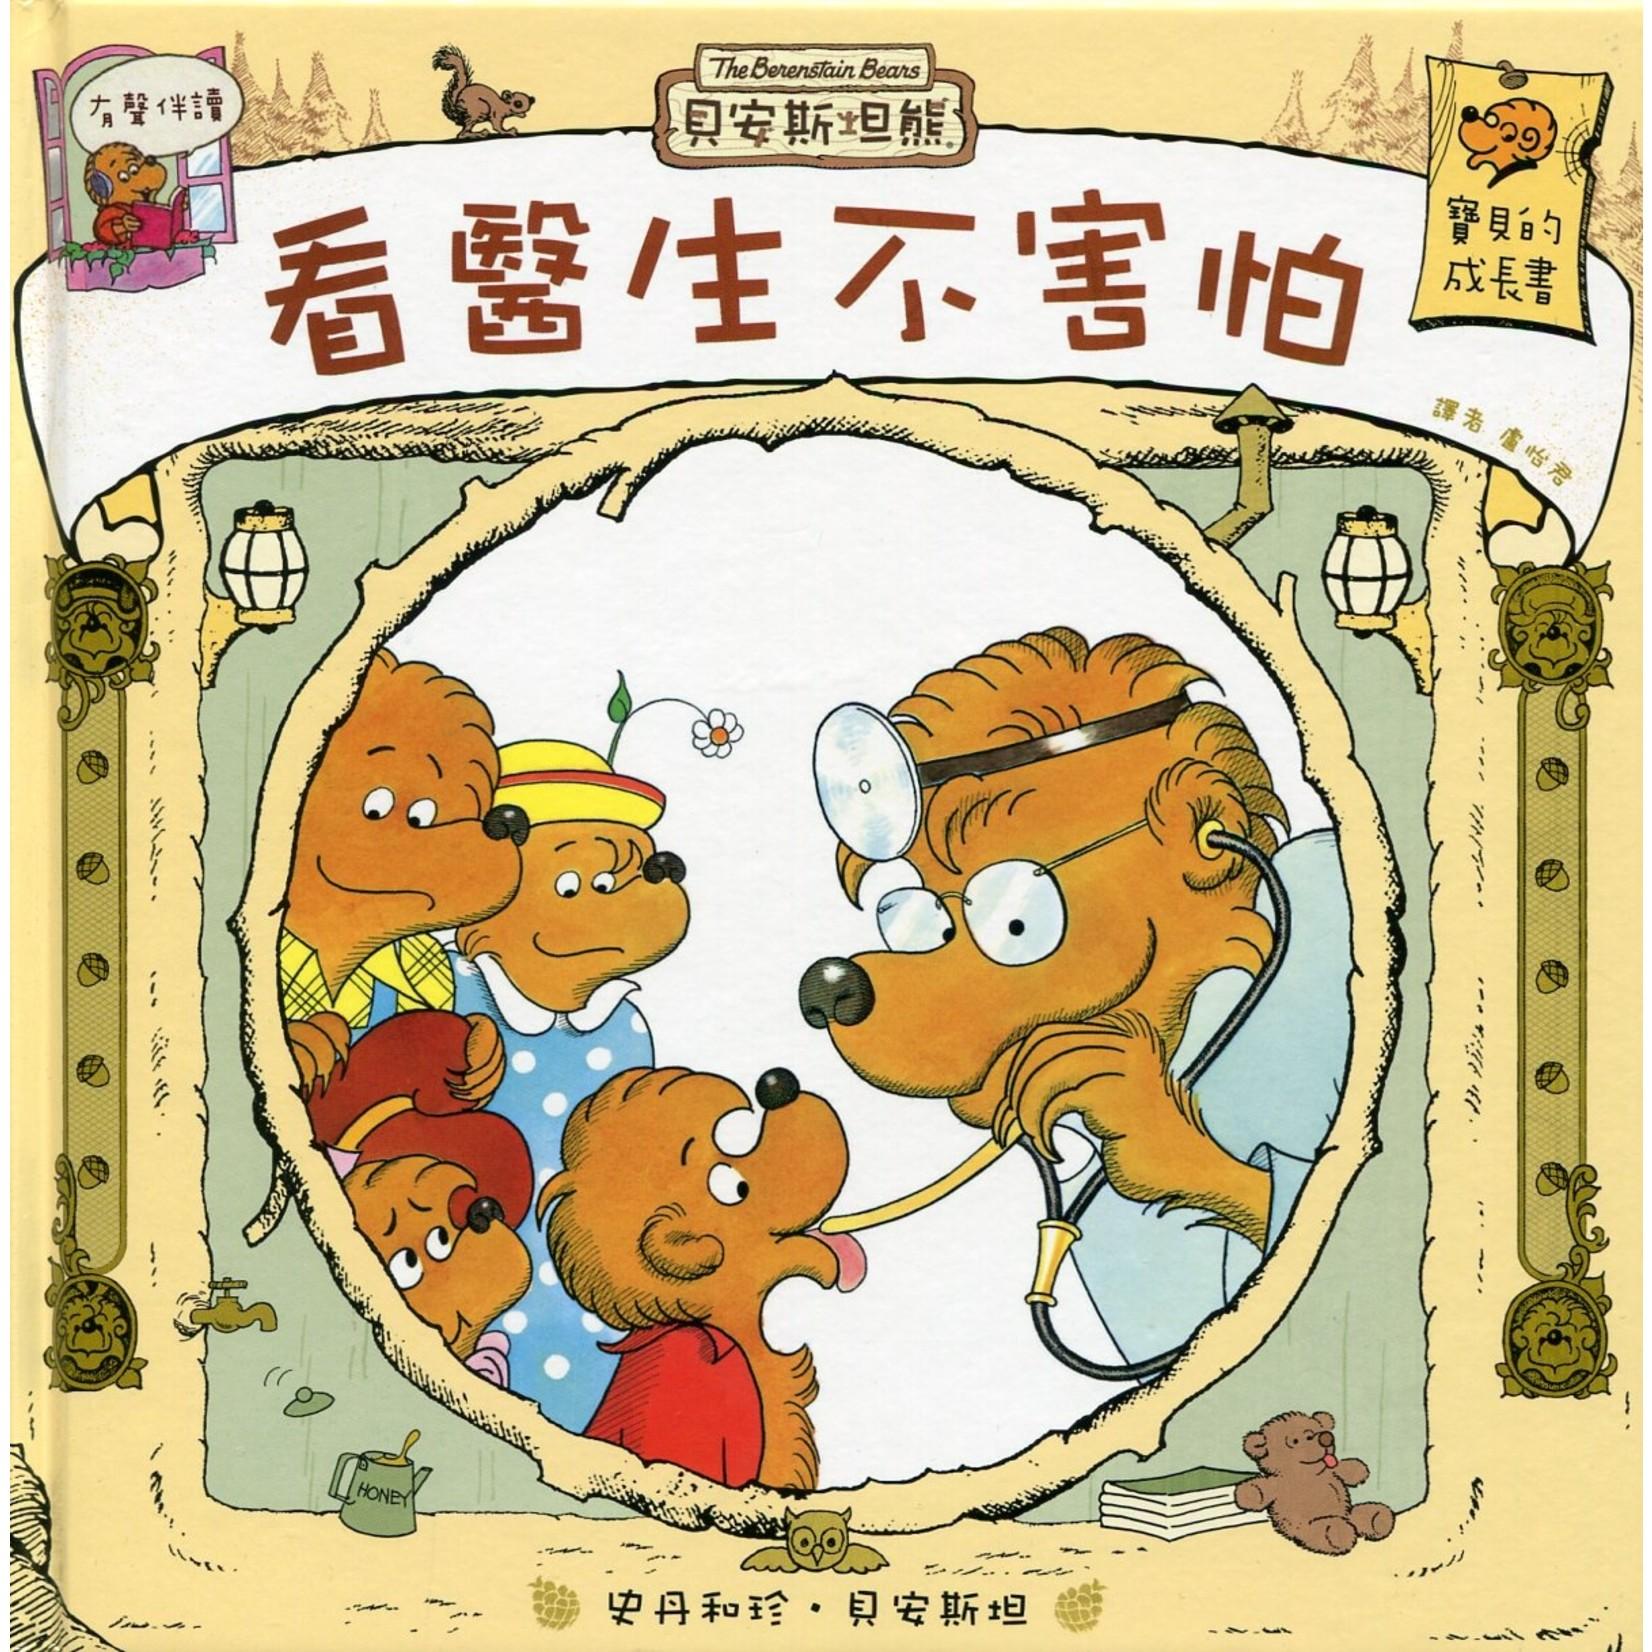 生命樹 Life Tree Global 貝安斯坦熊系列14:看醫生不害怕 The Berenstain Bears Go To The Doctor